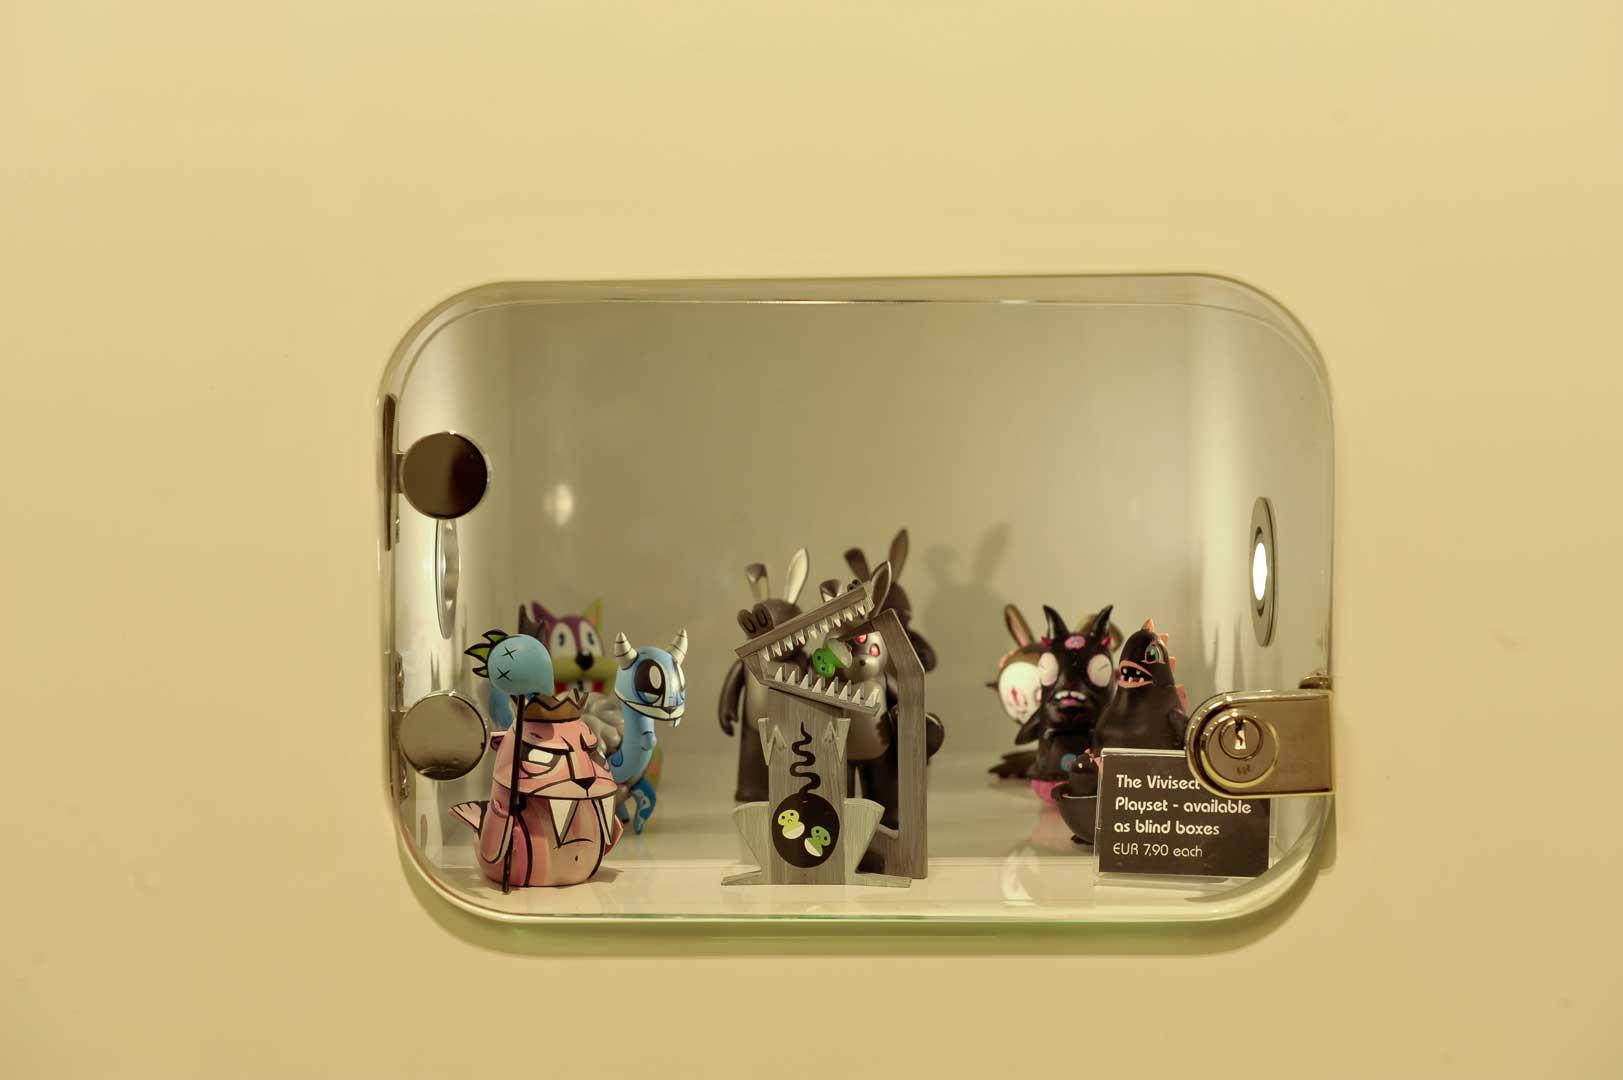 Galeriebild / Yukifish Designer Toys